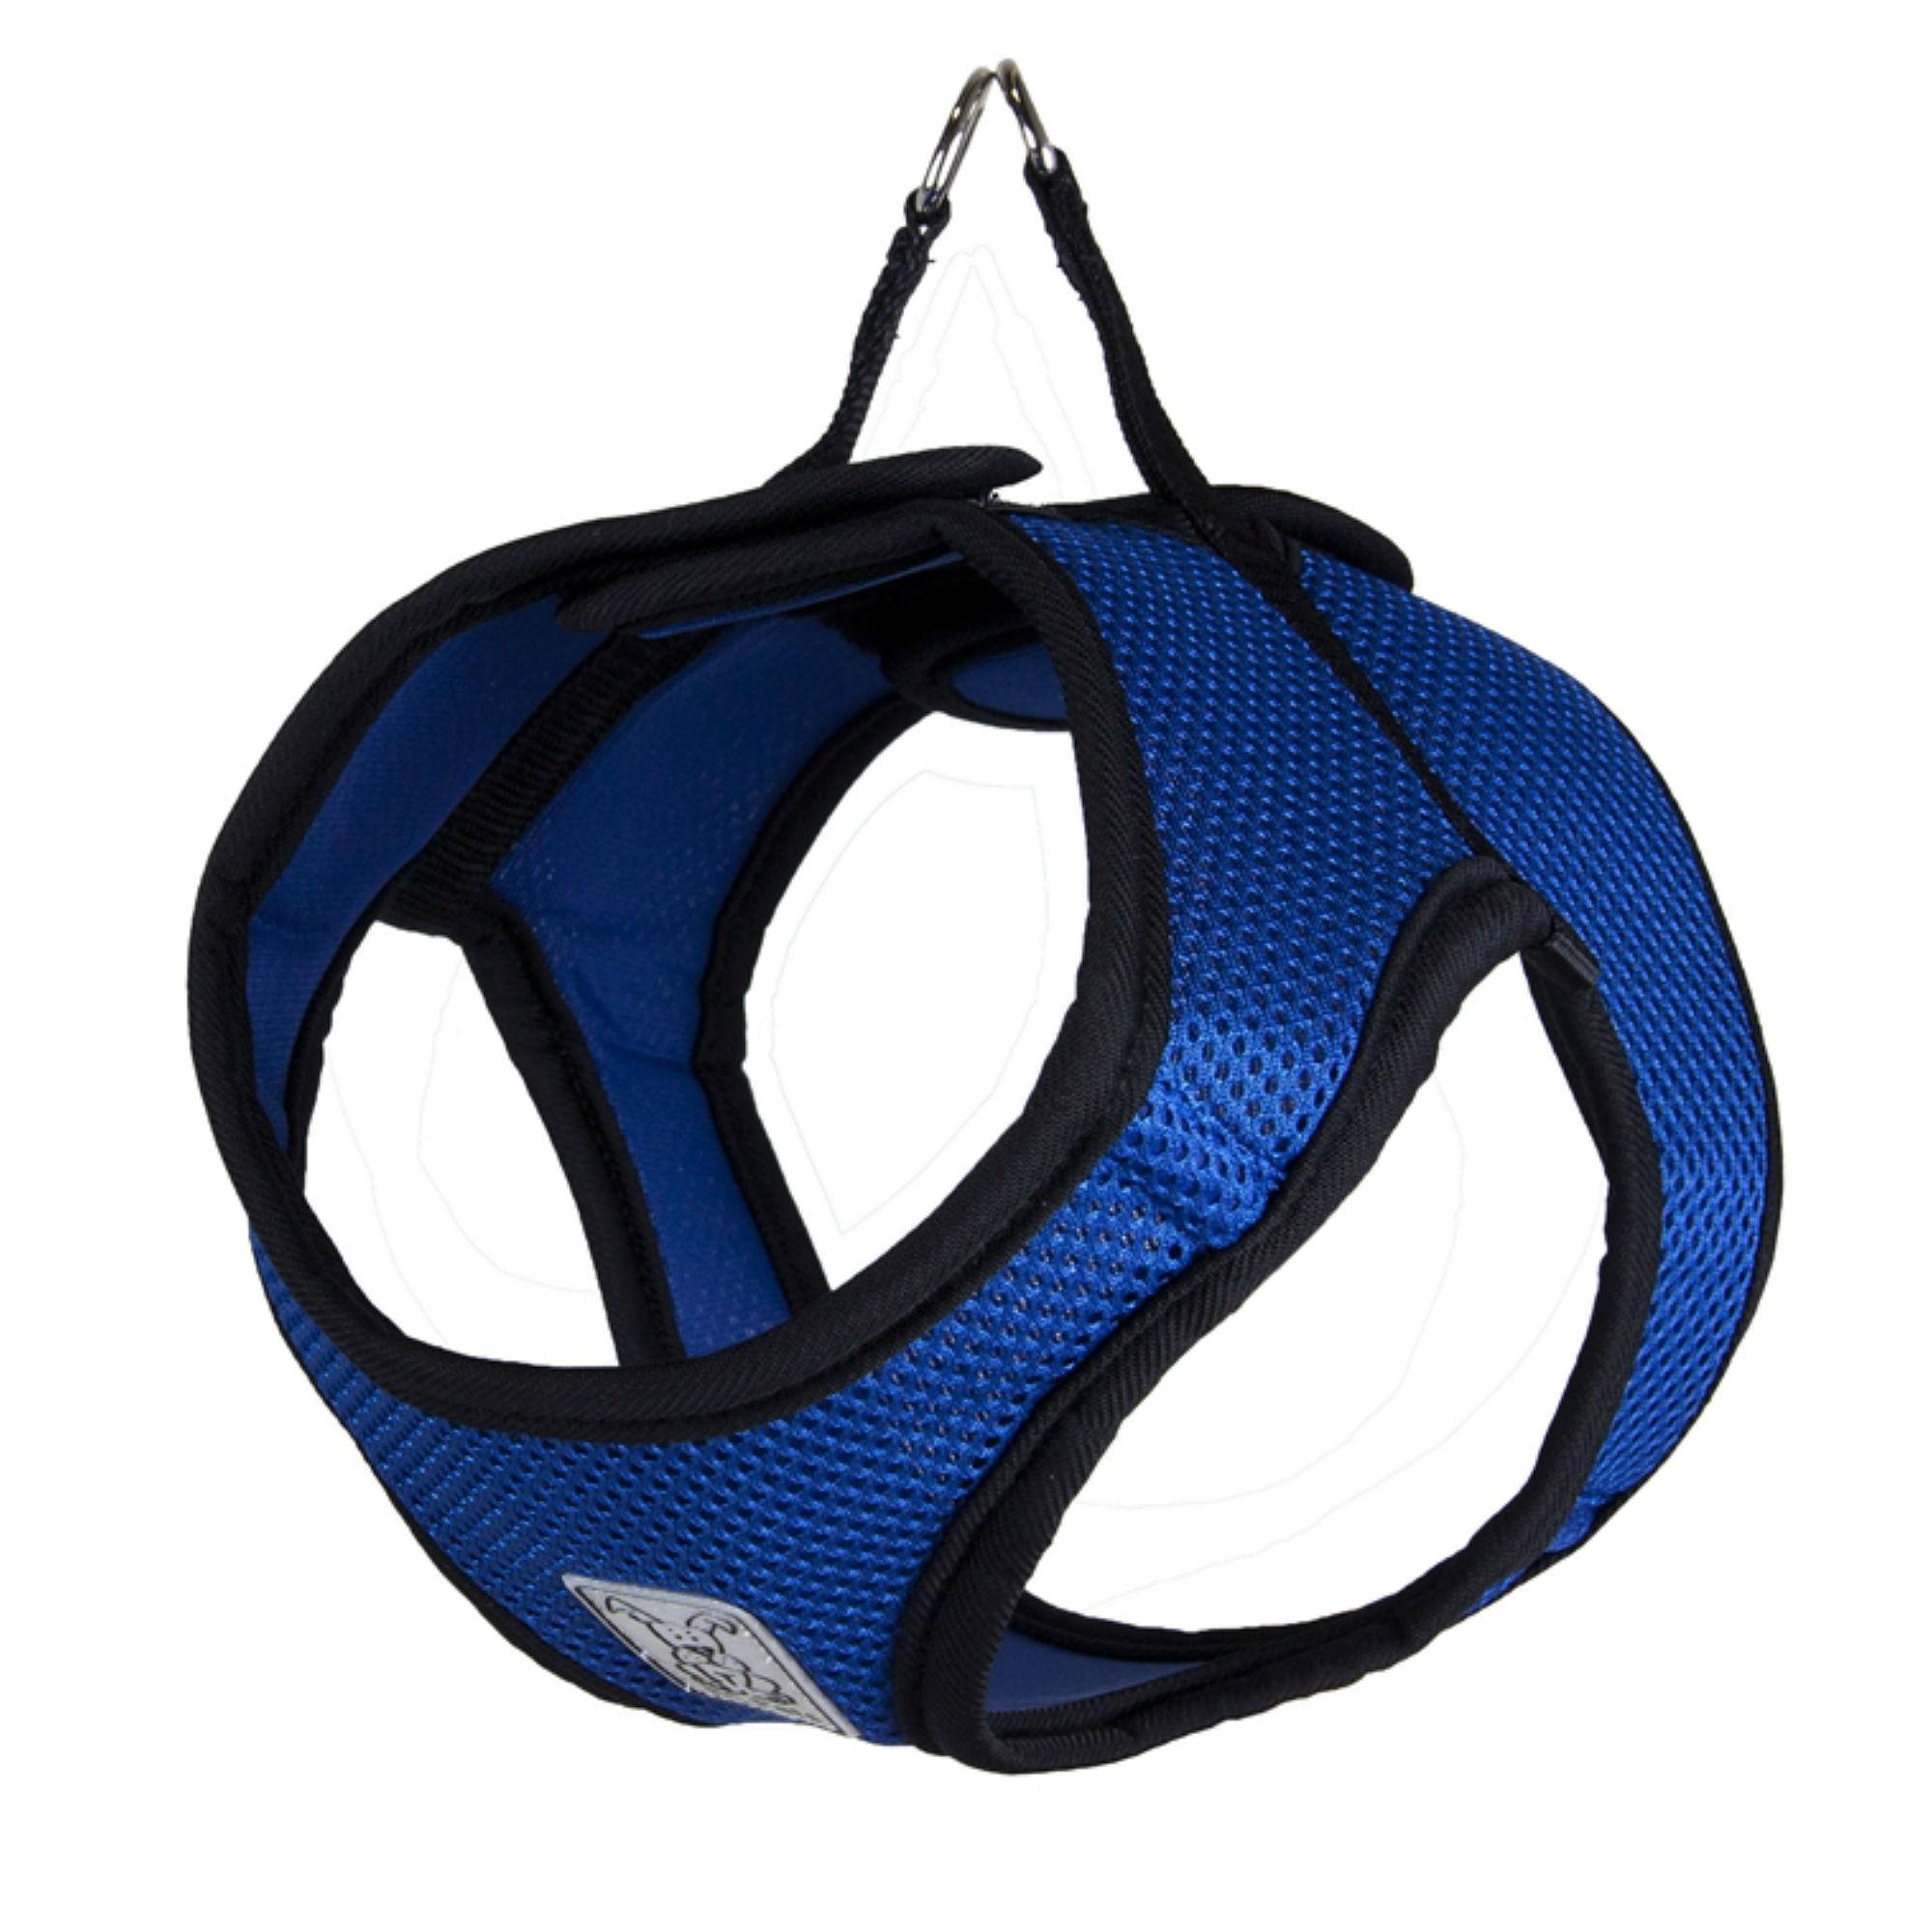 Step-in Cirque Dog Harness - Cobalt Blue